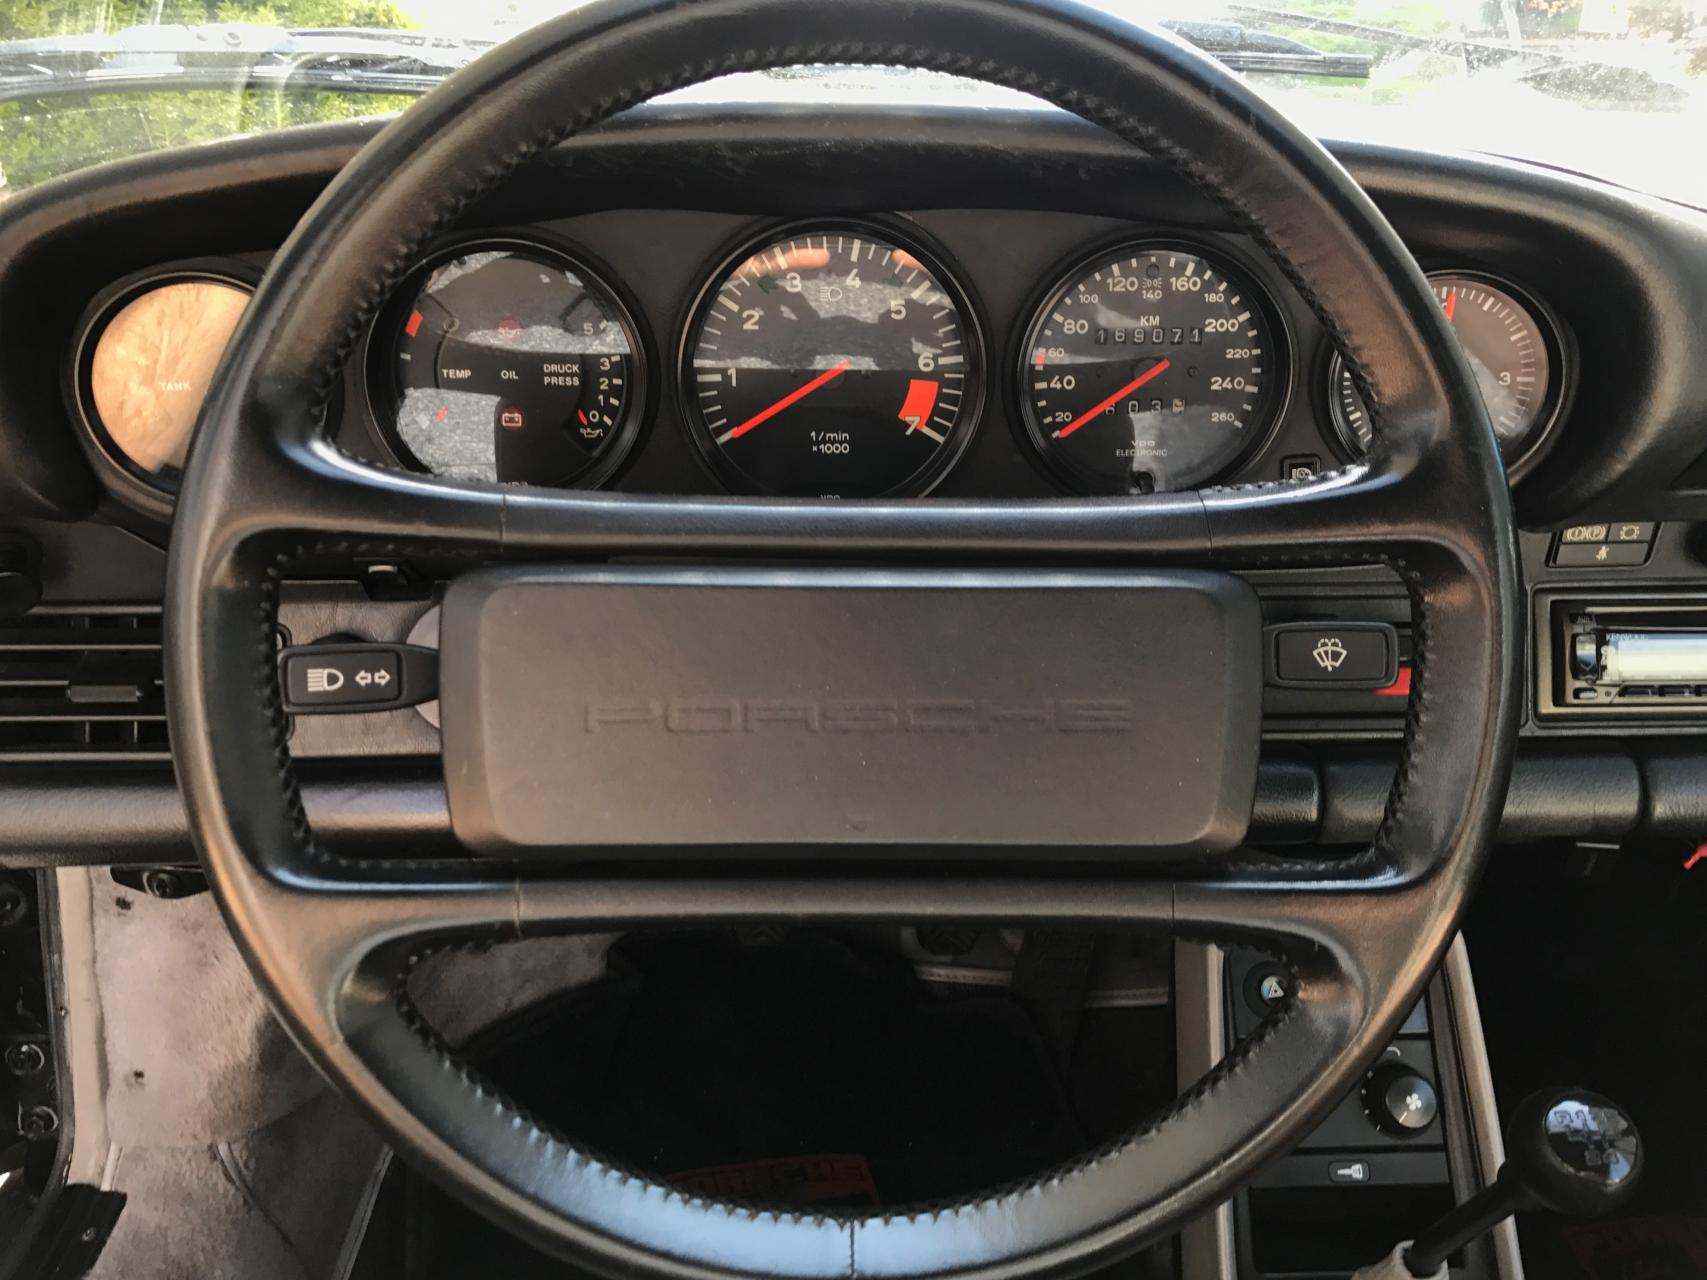 911 youngtimer - Porsche 911 Carrera G50 - Black - 1988 - 2 of 3